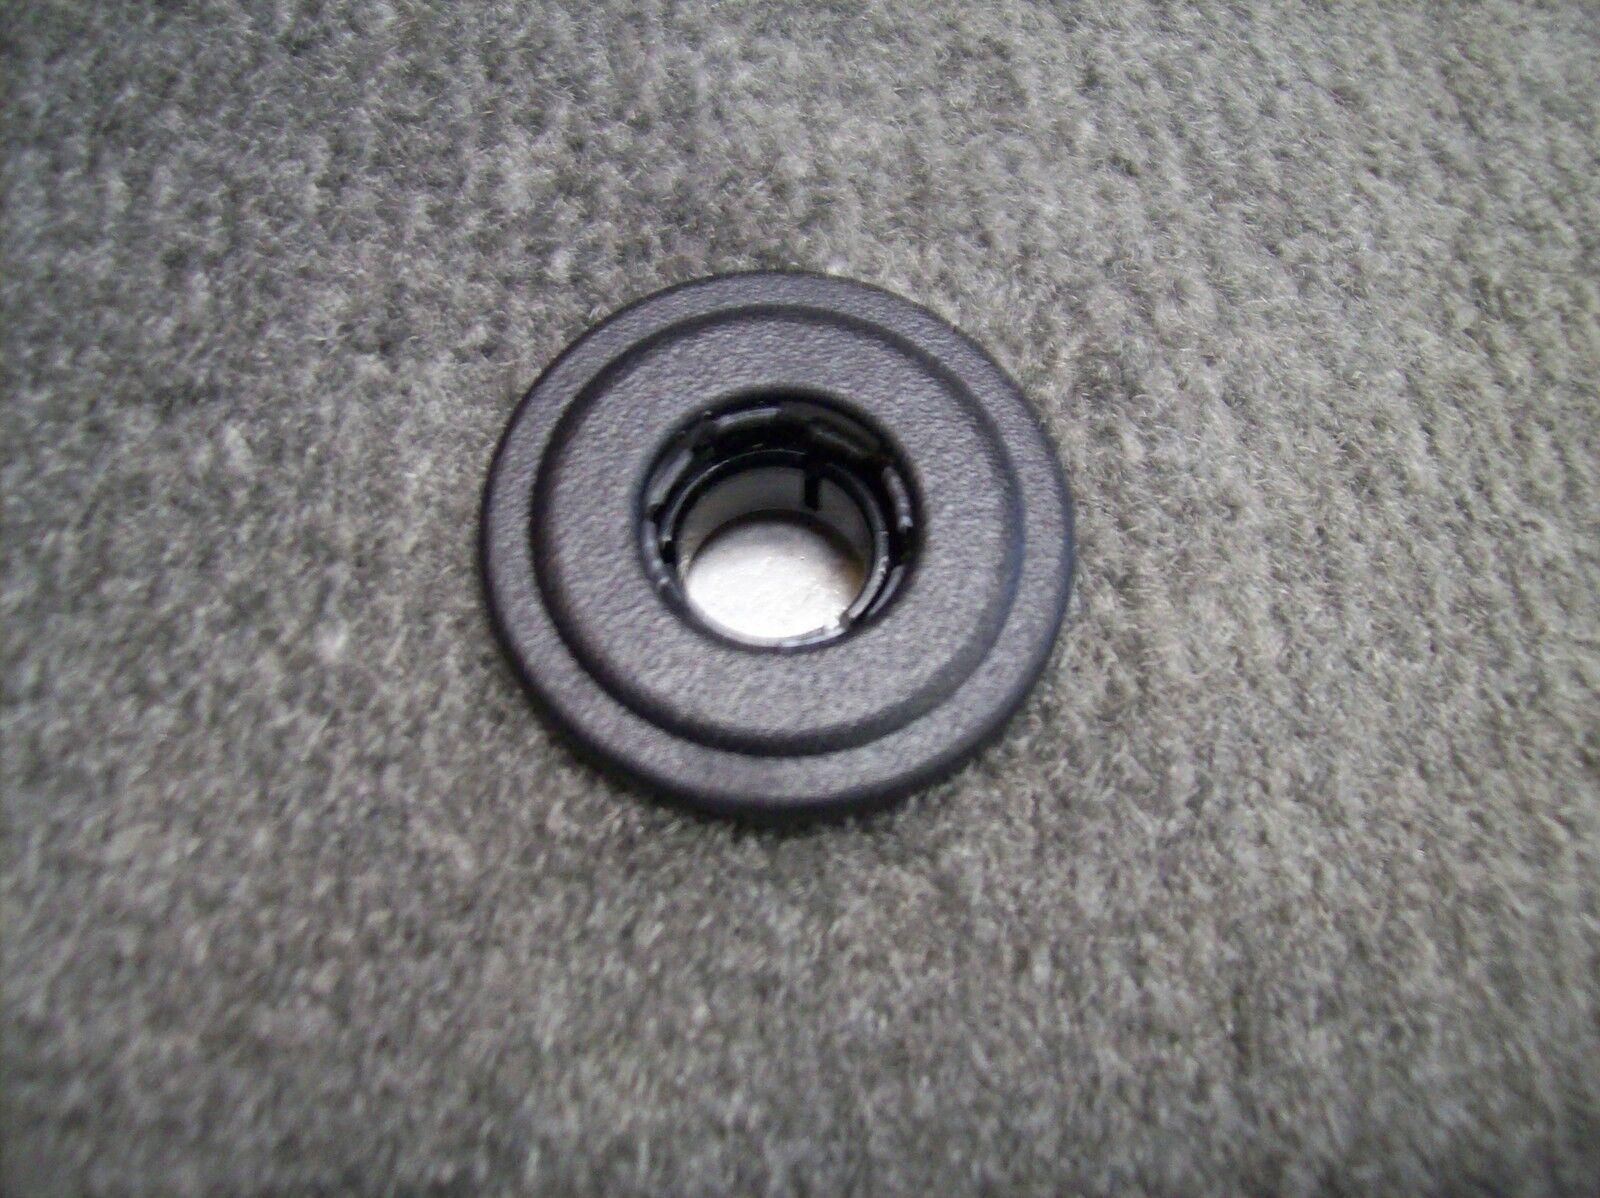 TOYOTA SCION LEXUS CARPET REPAIR GROMMET FOR FLOOR MAT HOOK HOLE  5829750020